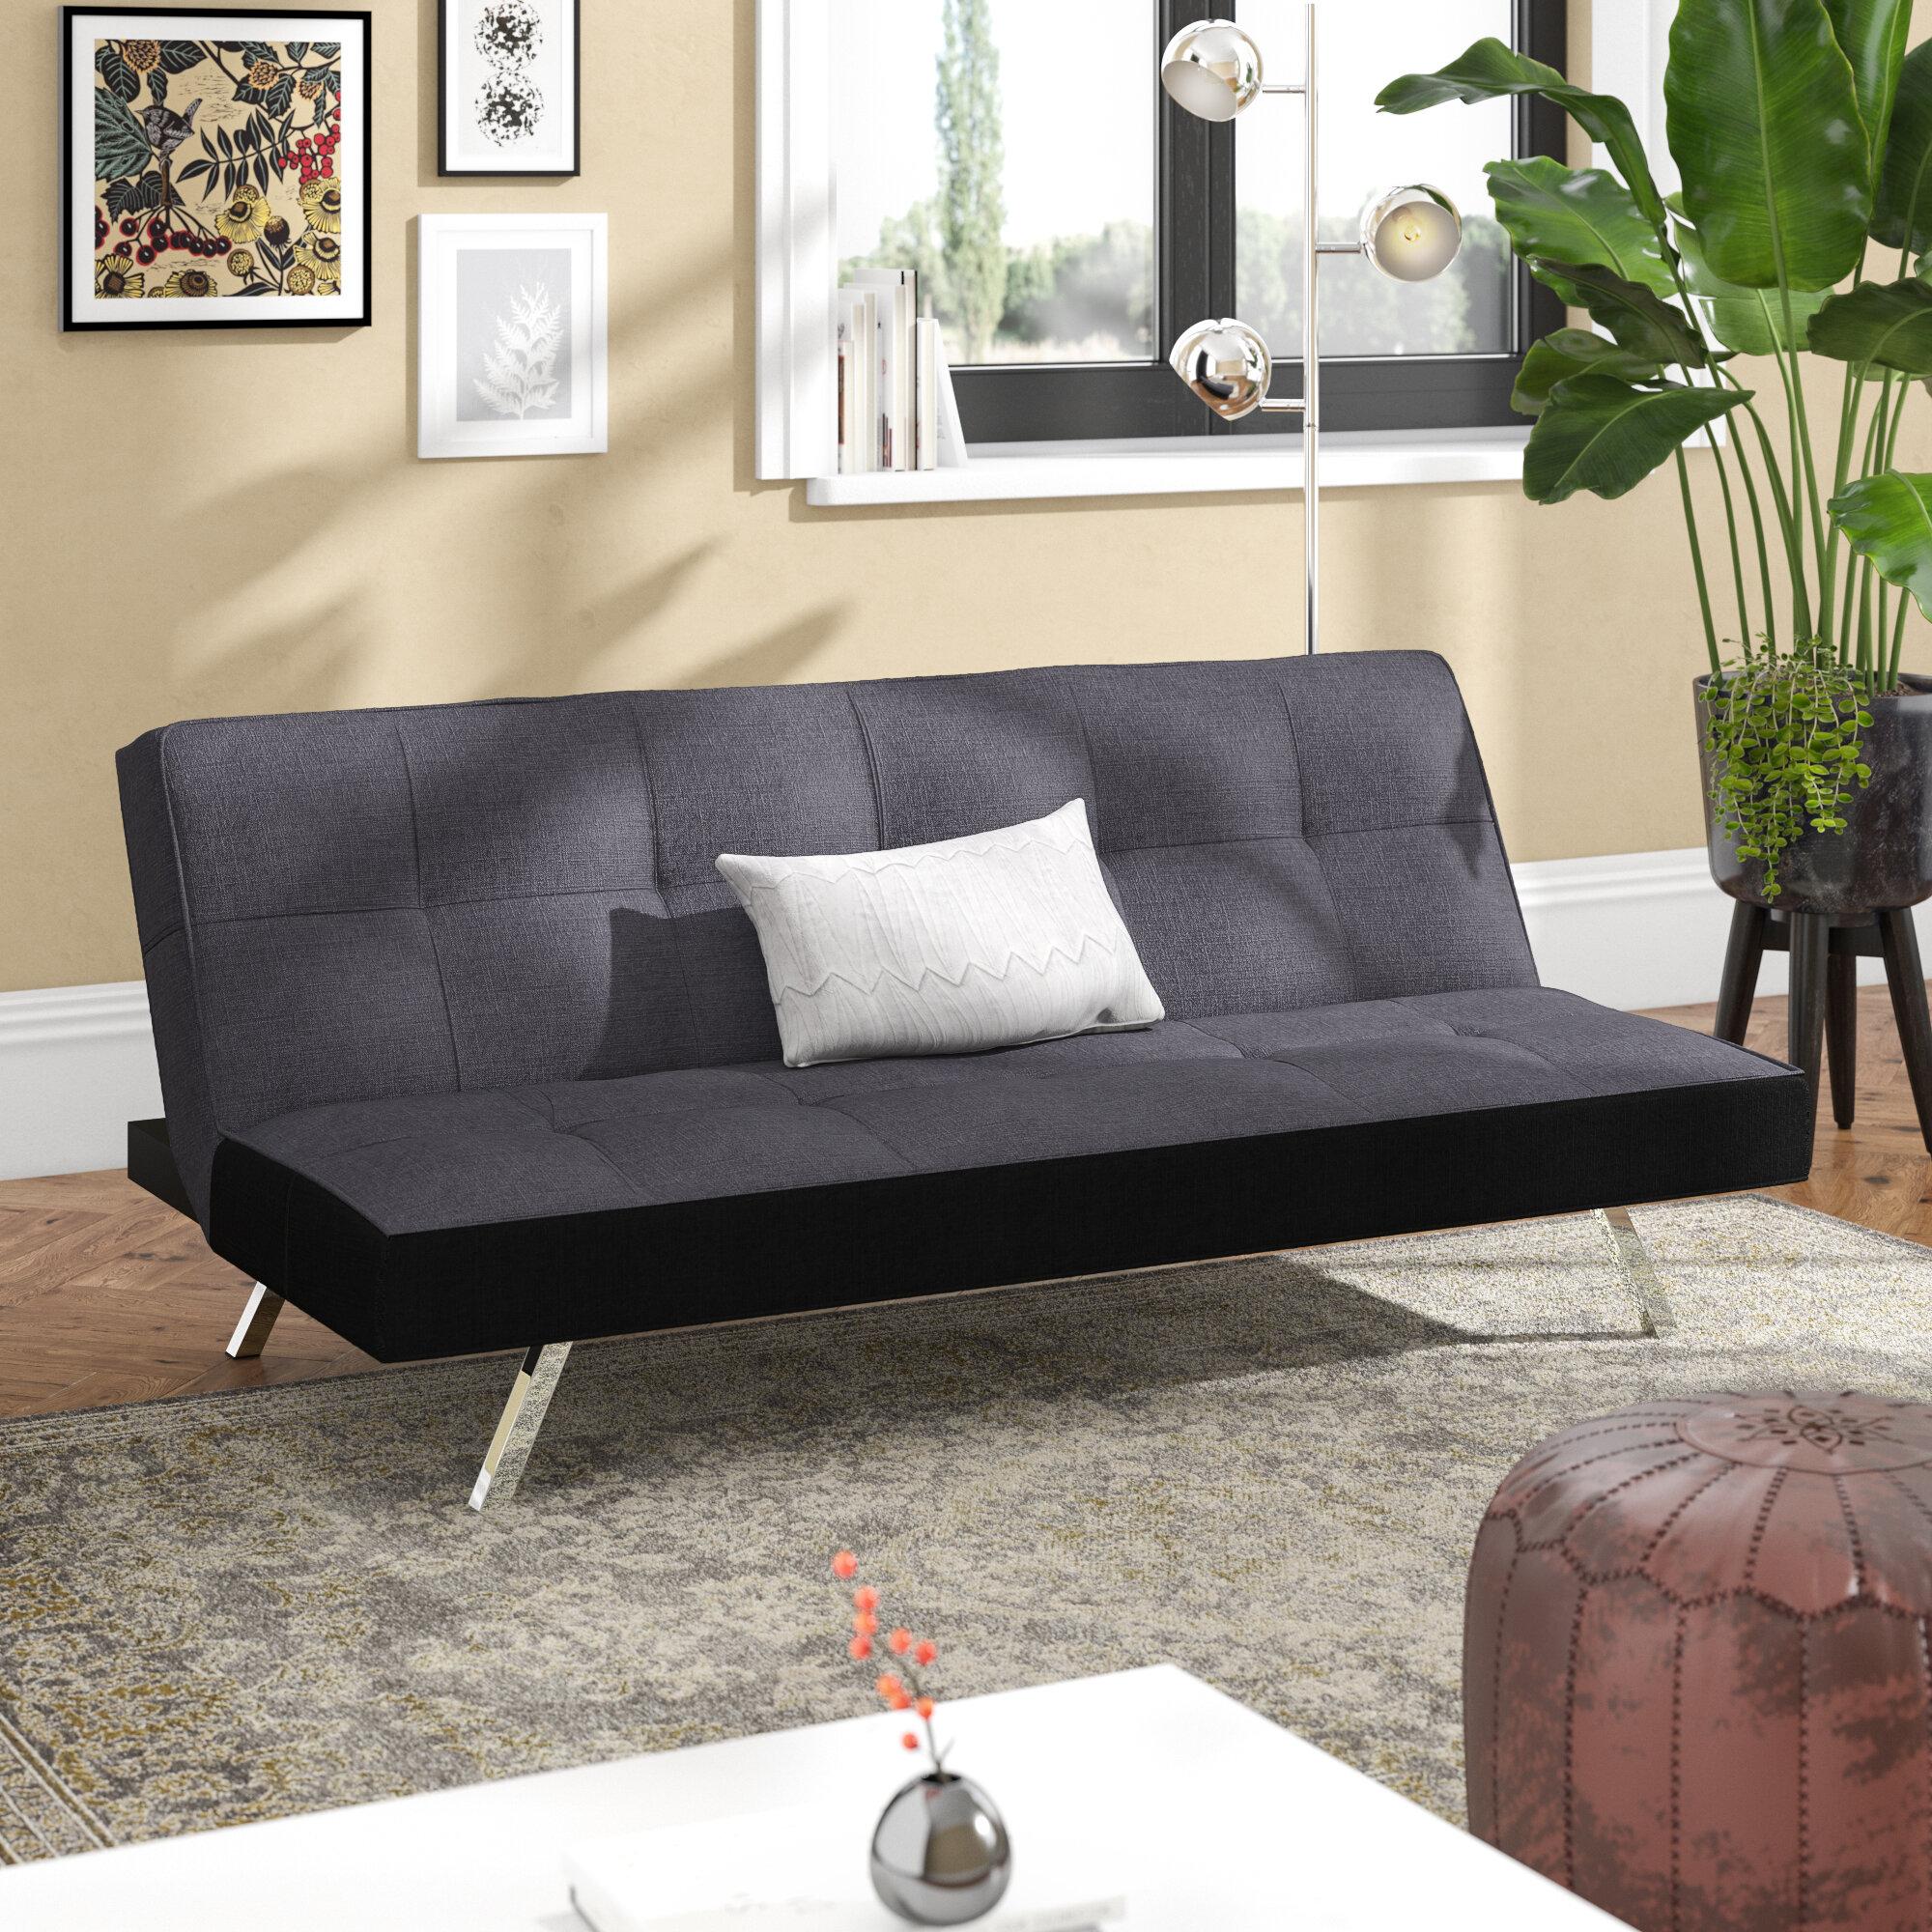 Leader Lifestyle Rialto 3 Seater Clic Clac Sofa Bed Reviews Wayfair Co Uk